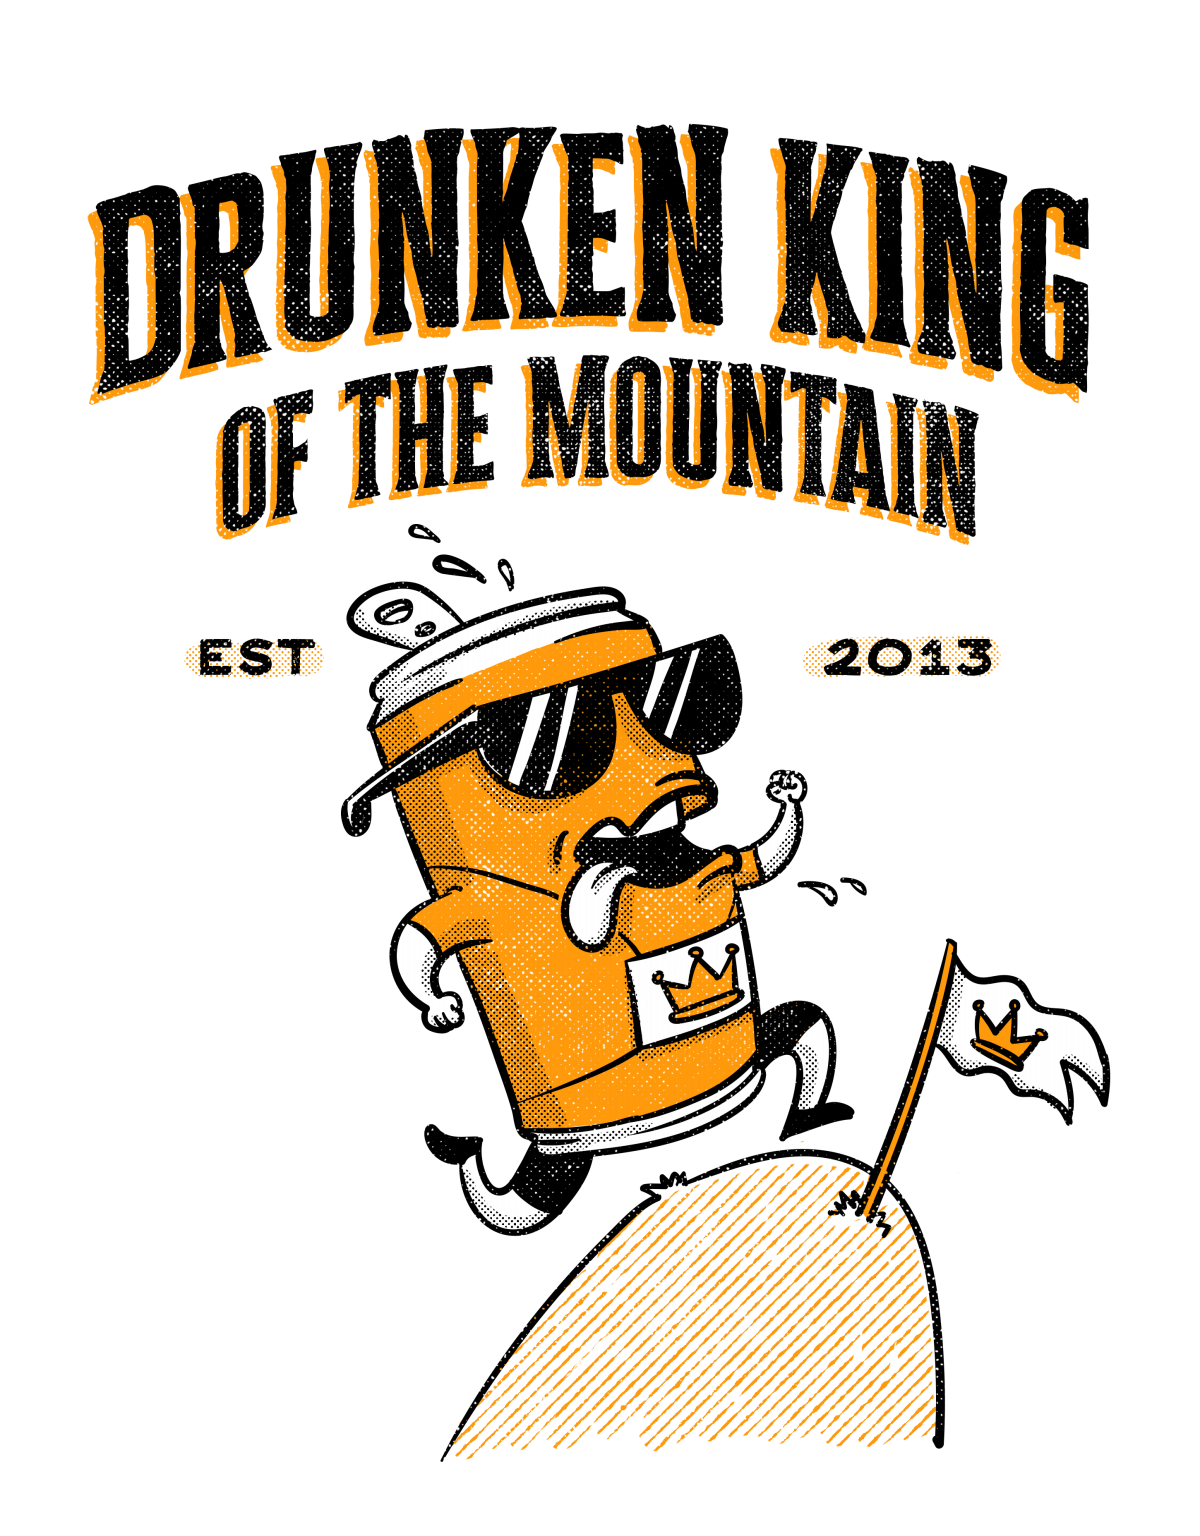 Drunket King of the Mountain